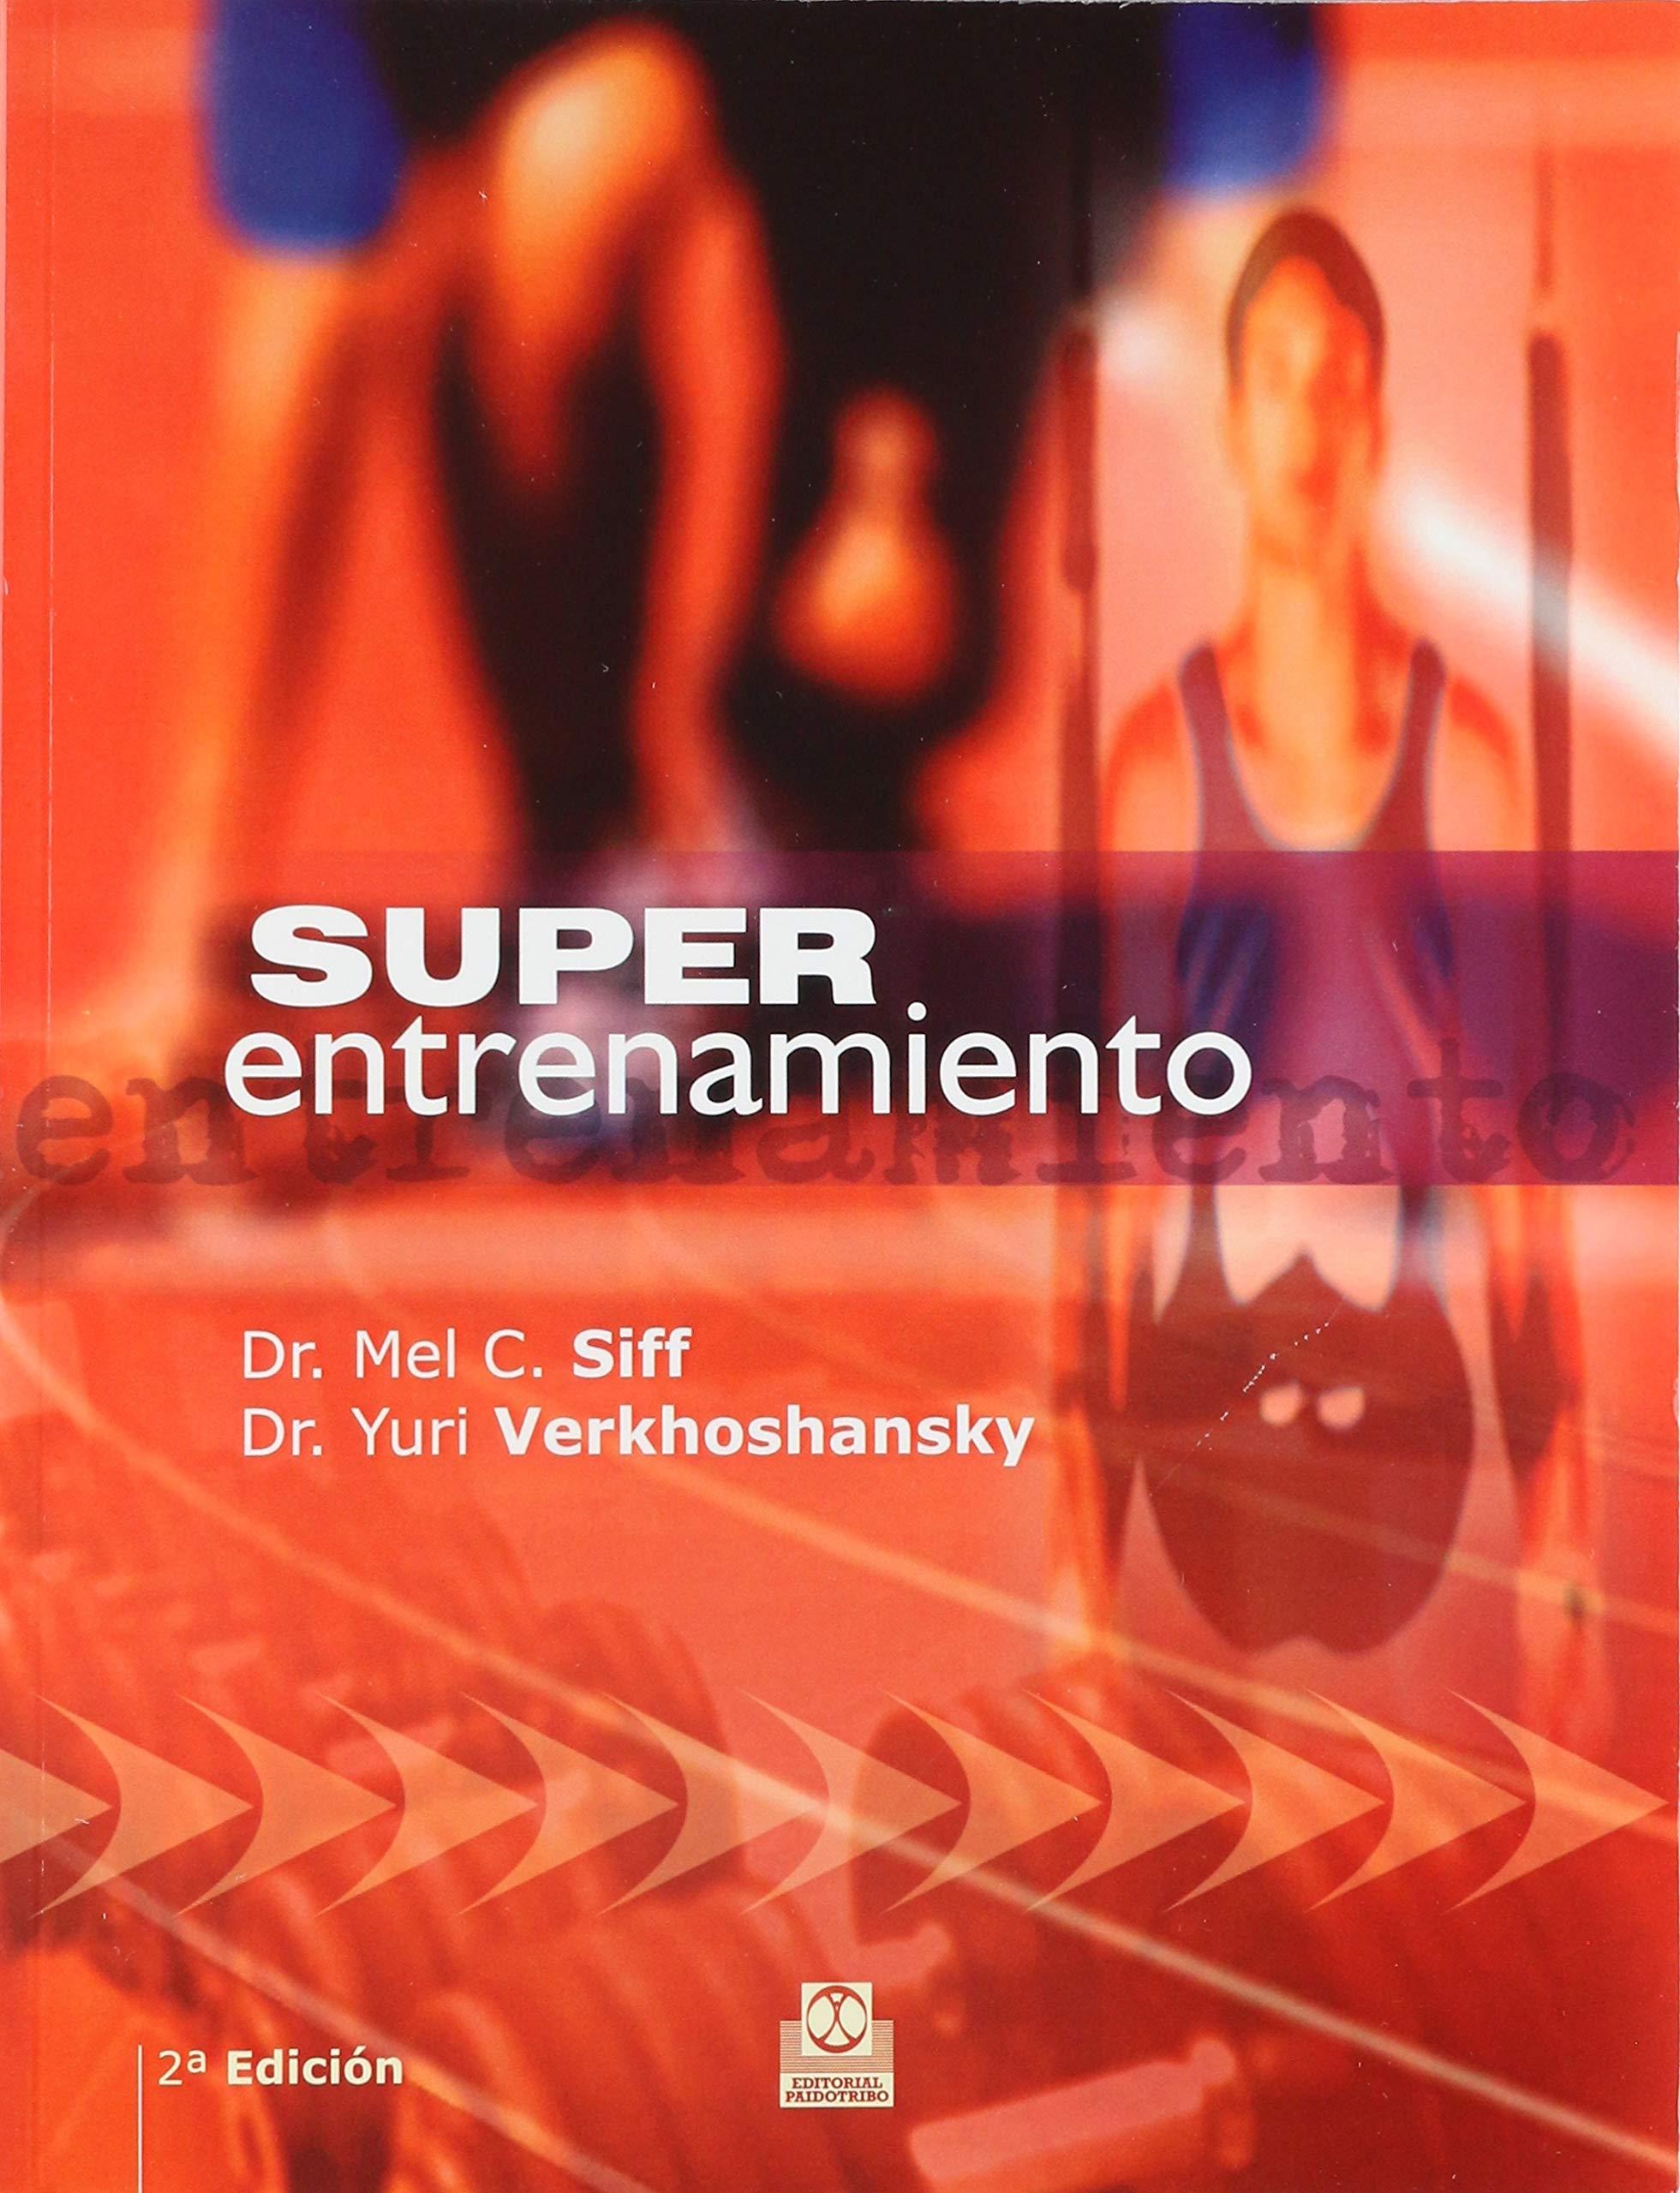 Super Entrenamiento (Spanish Edition) by Paidotribo Editorial